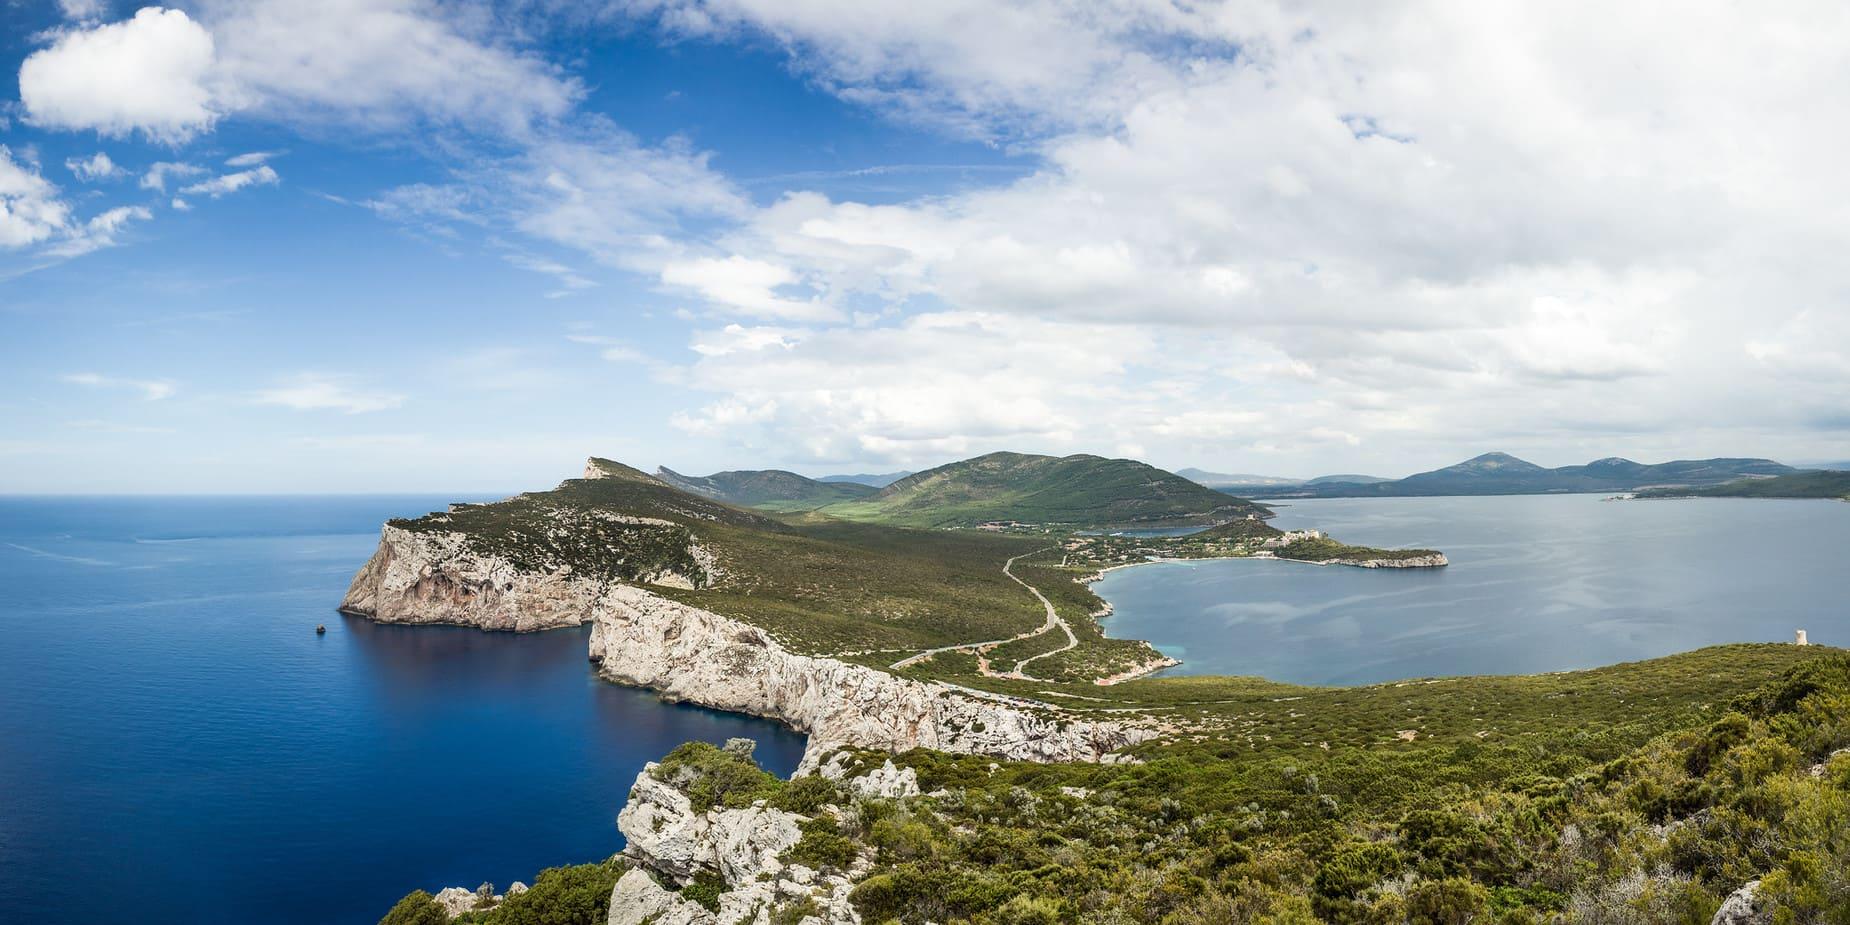 migliori-agriturismi-con-piscina-in-Sardegna